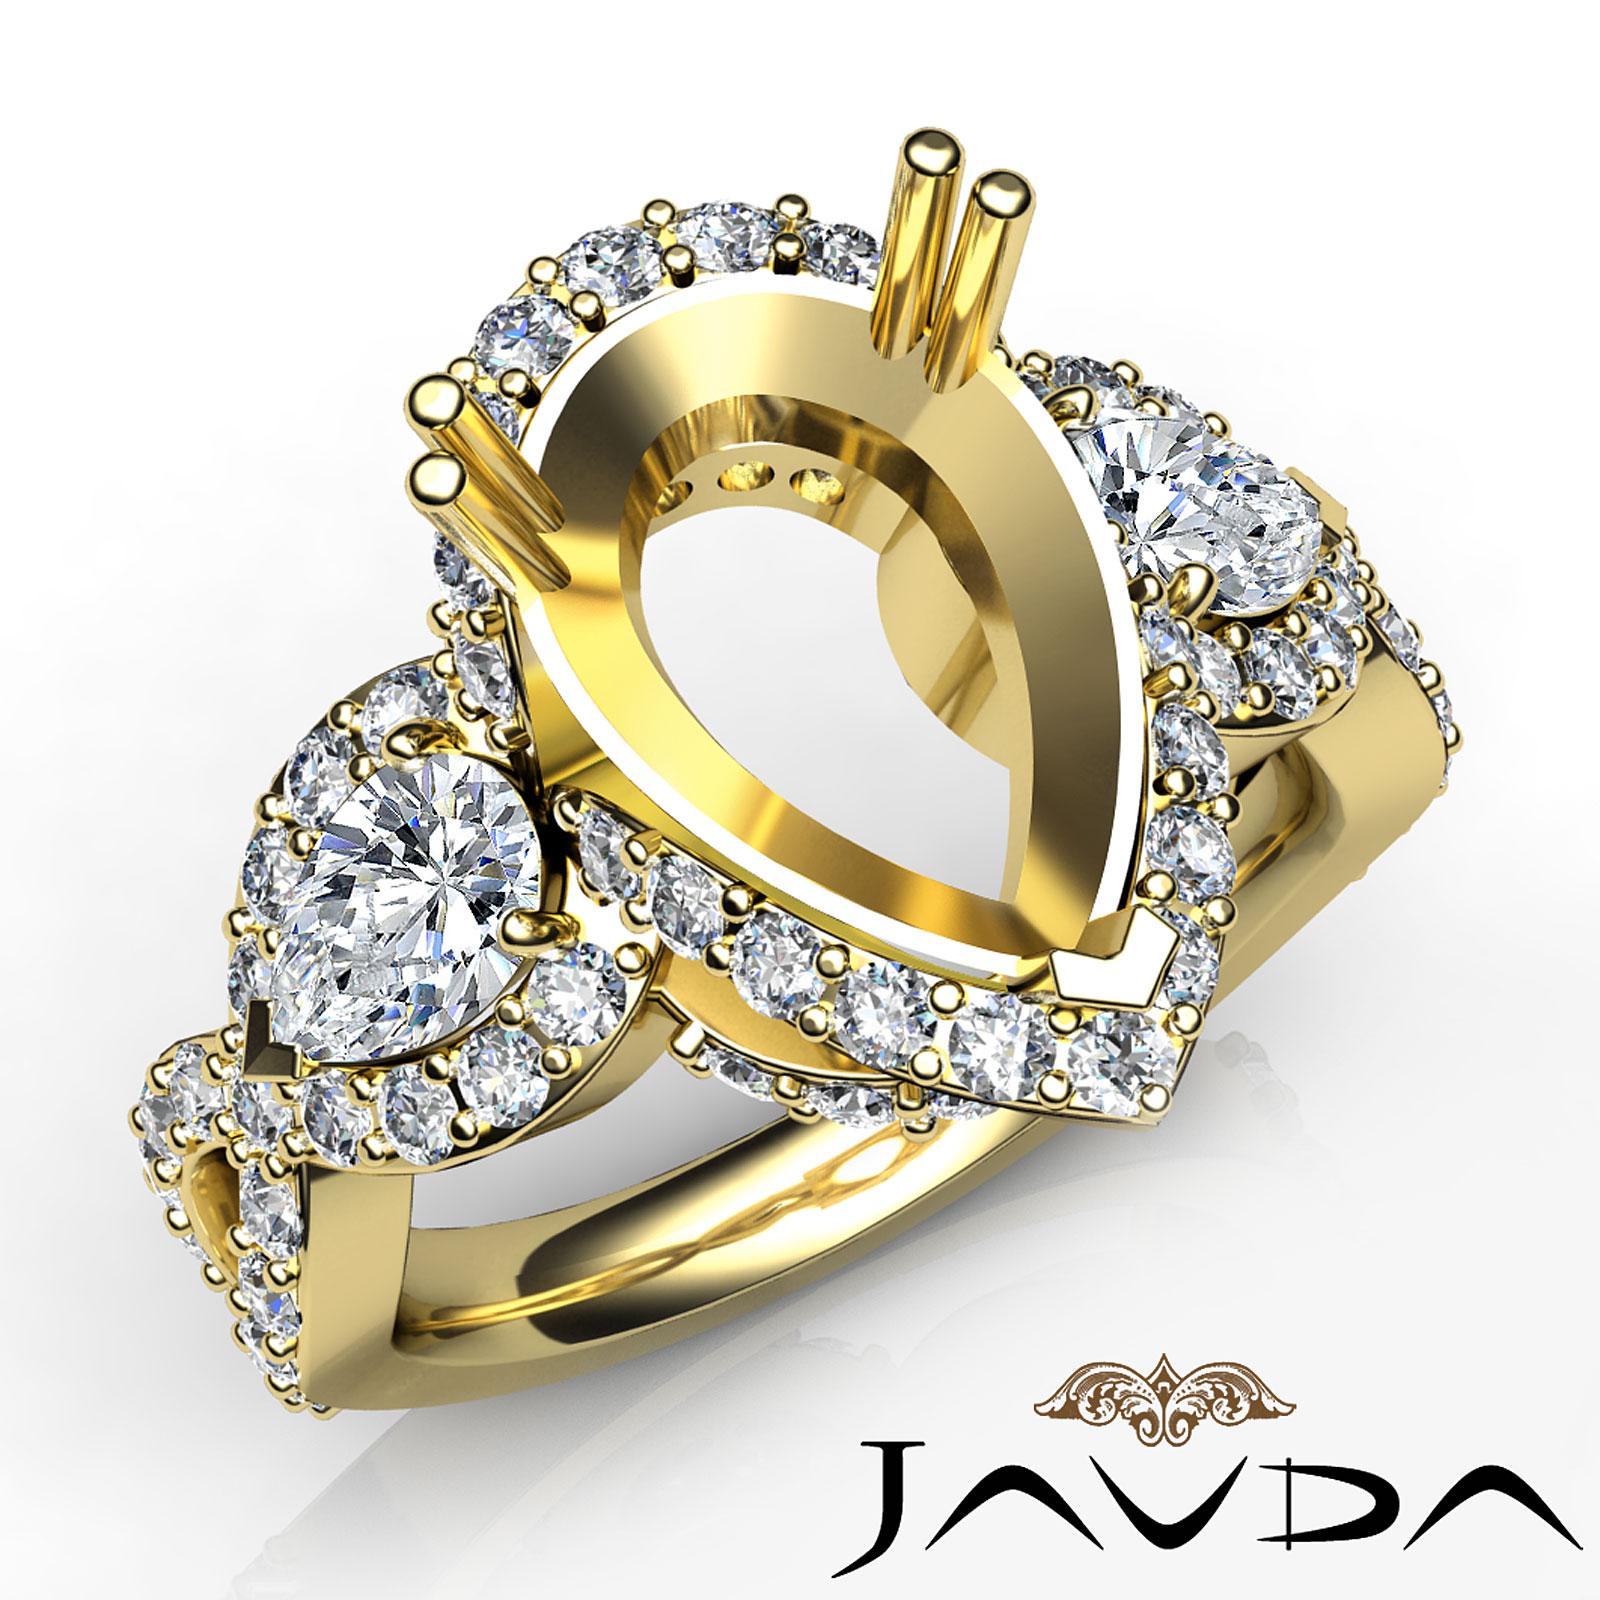 diamond 3 stone anniversary vintage ring 14k yellow gold. Black Bedroom Furniture Sets. Home Design Ideas